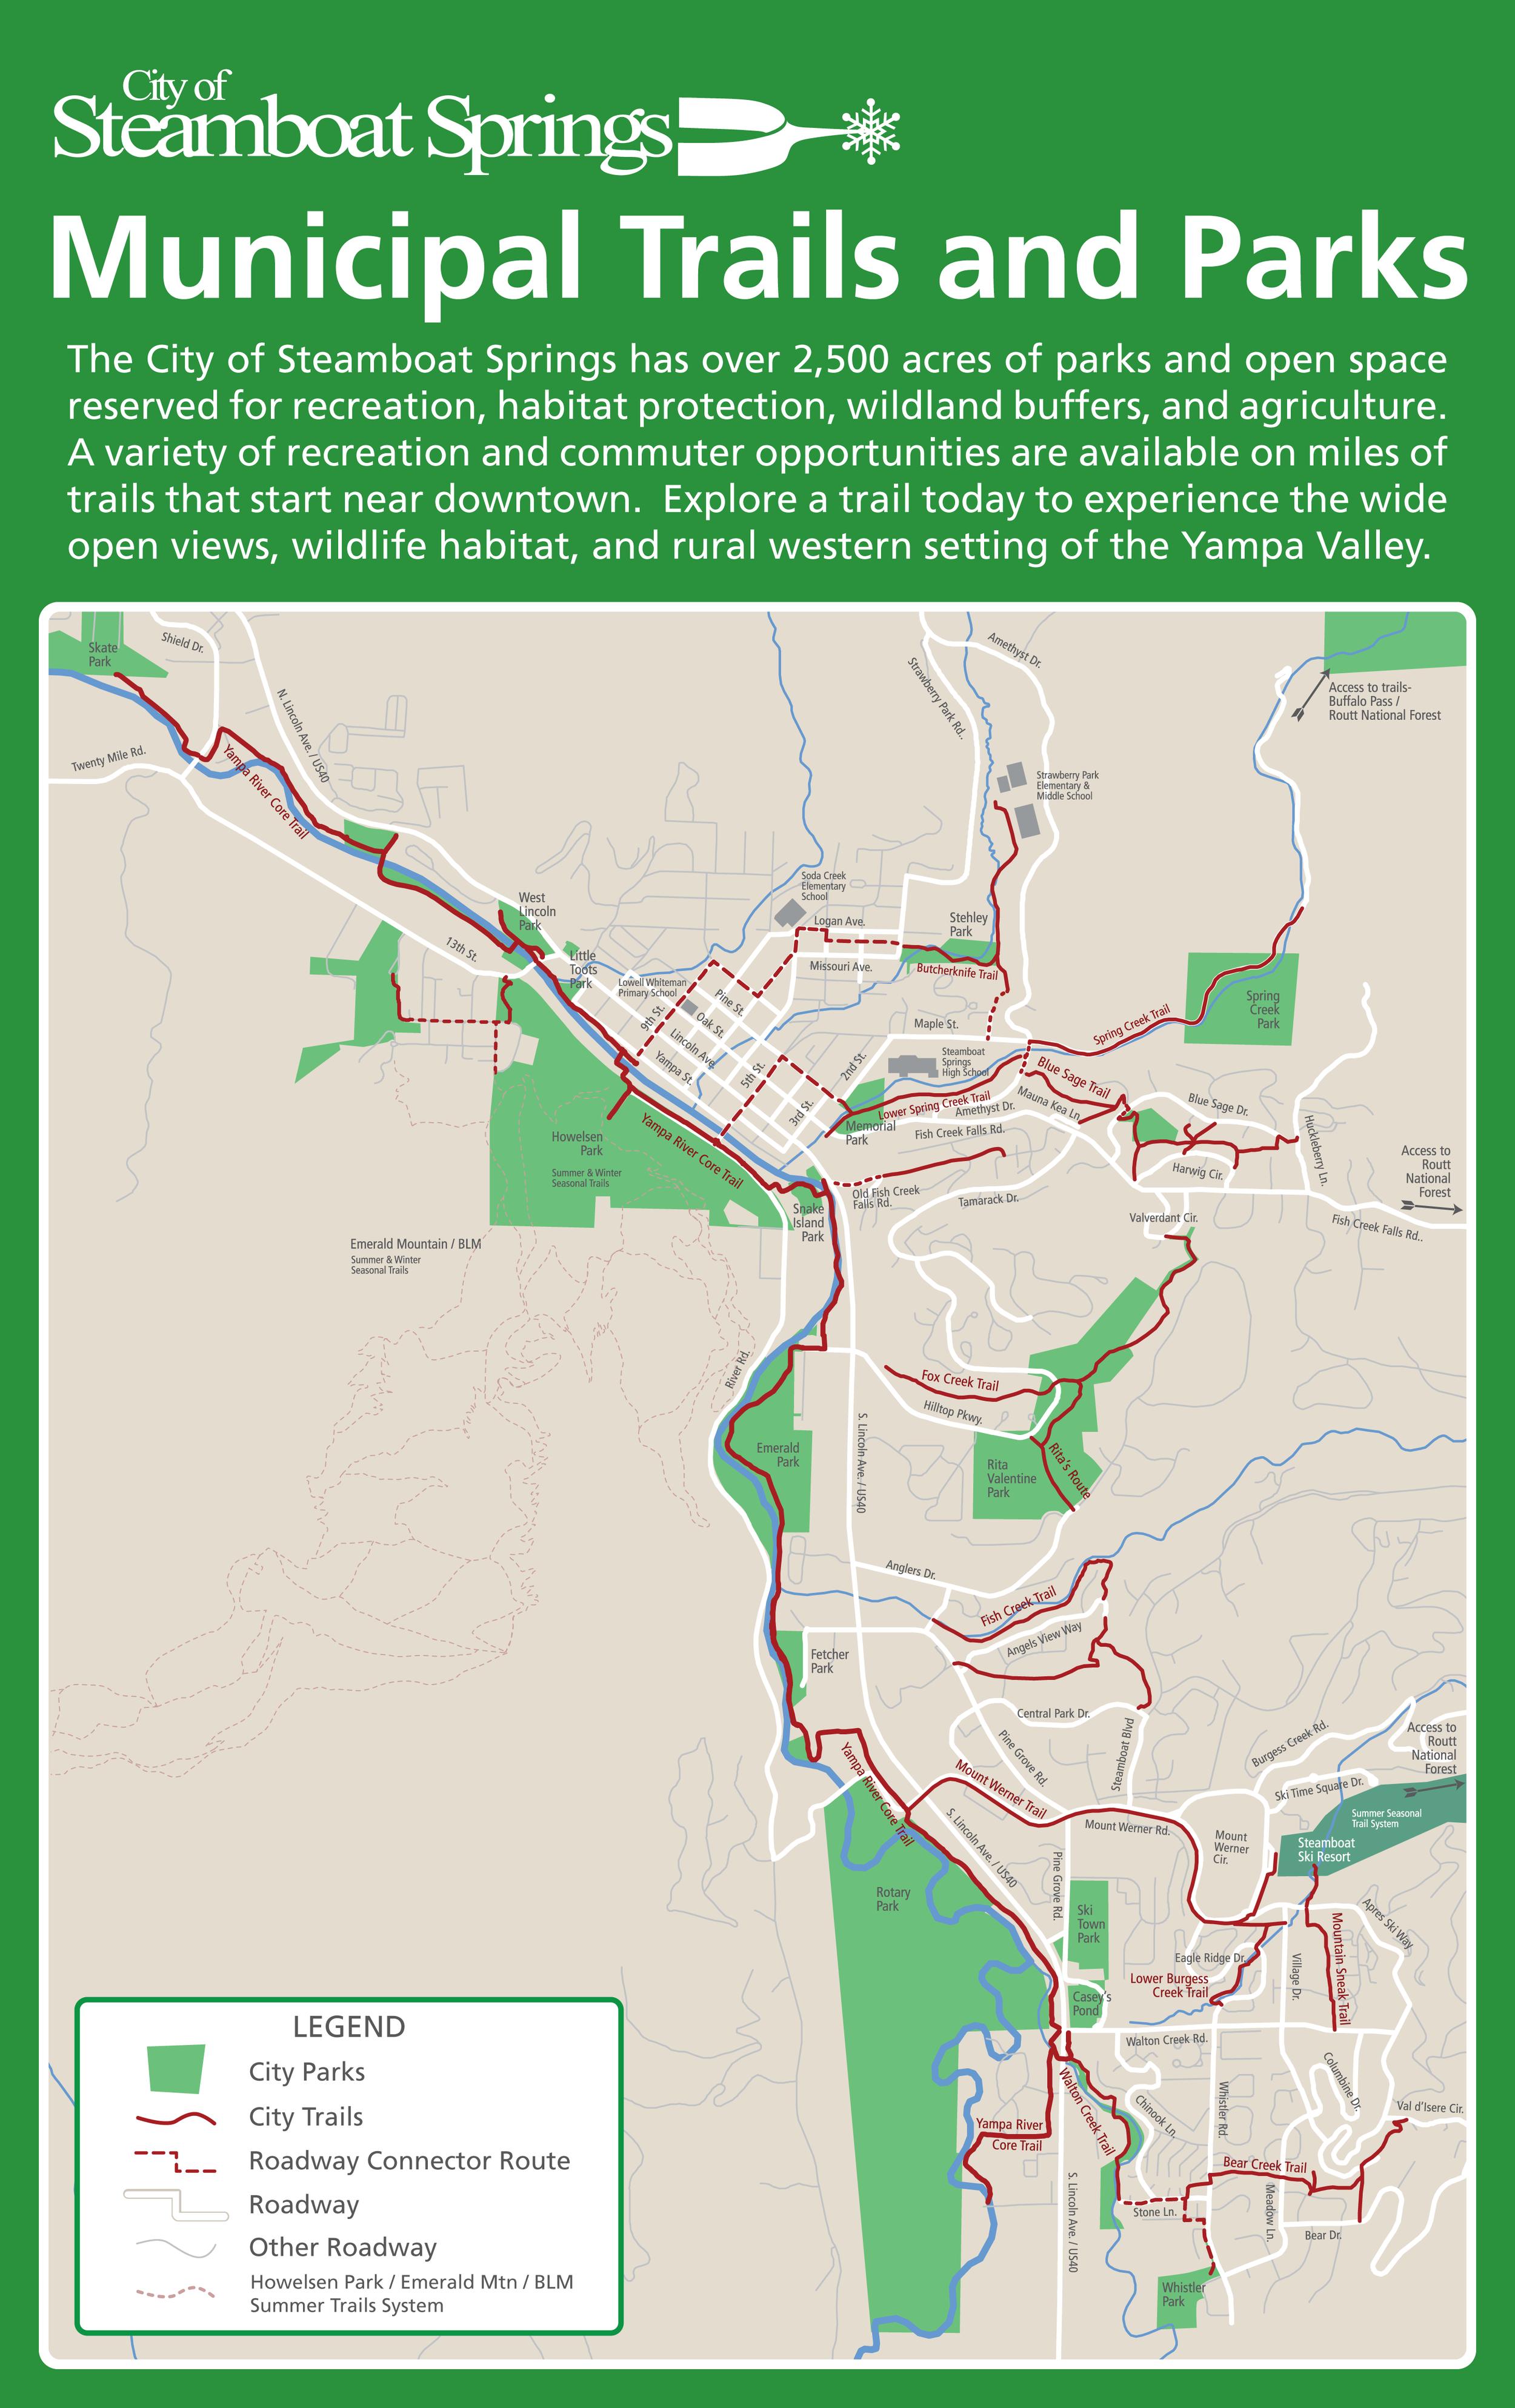 2-Kiosk Trails Map 3-26-12-01.png